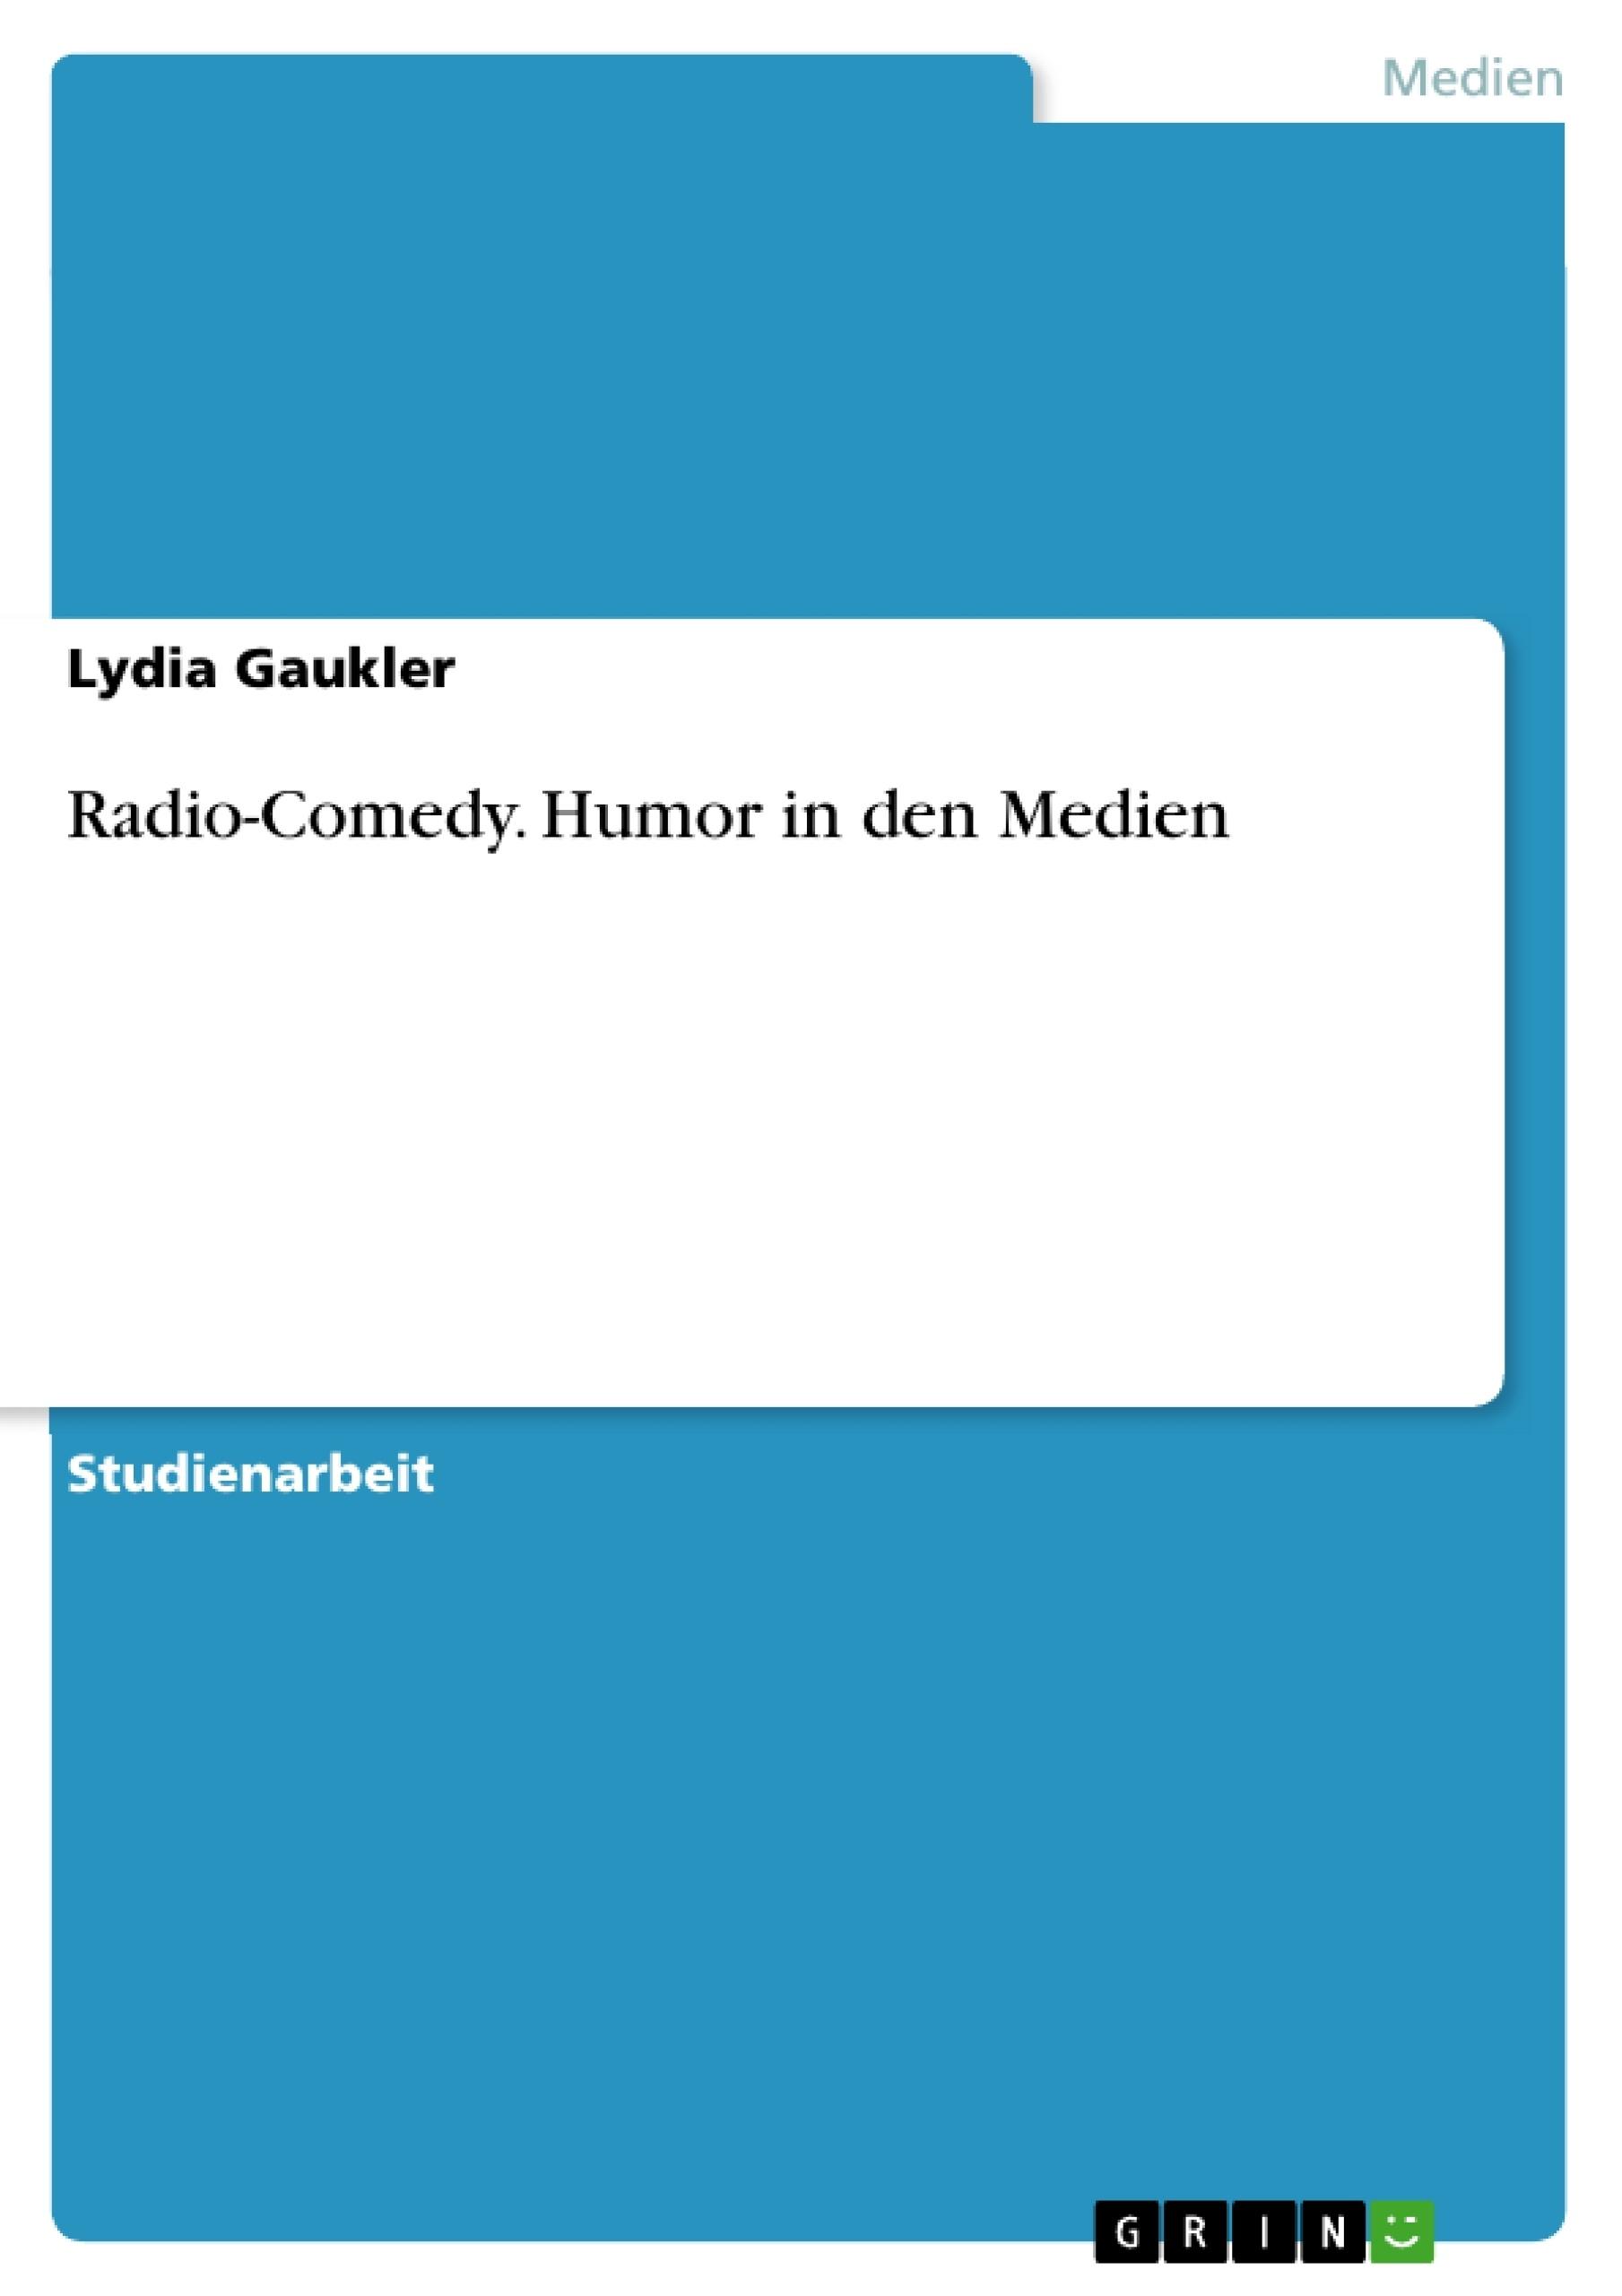 Titel: Radio-Comedy. Humor in den Medien